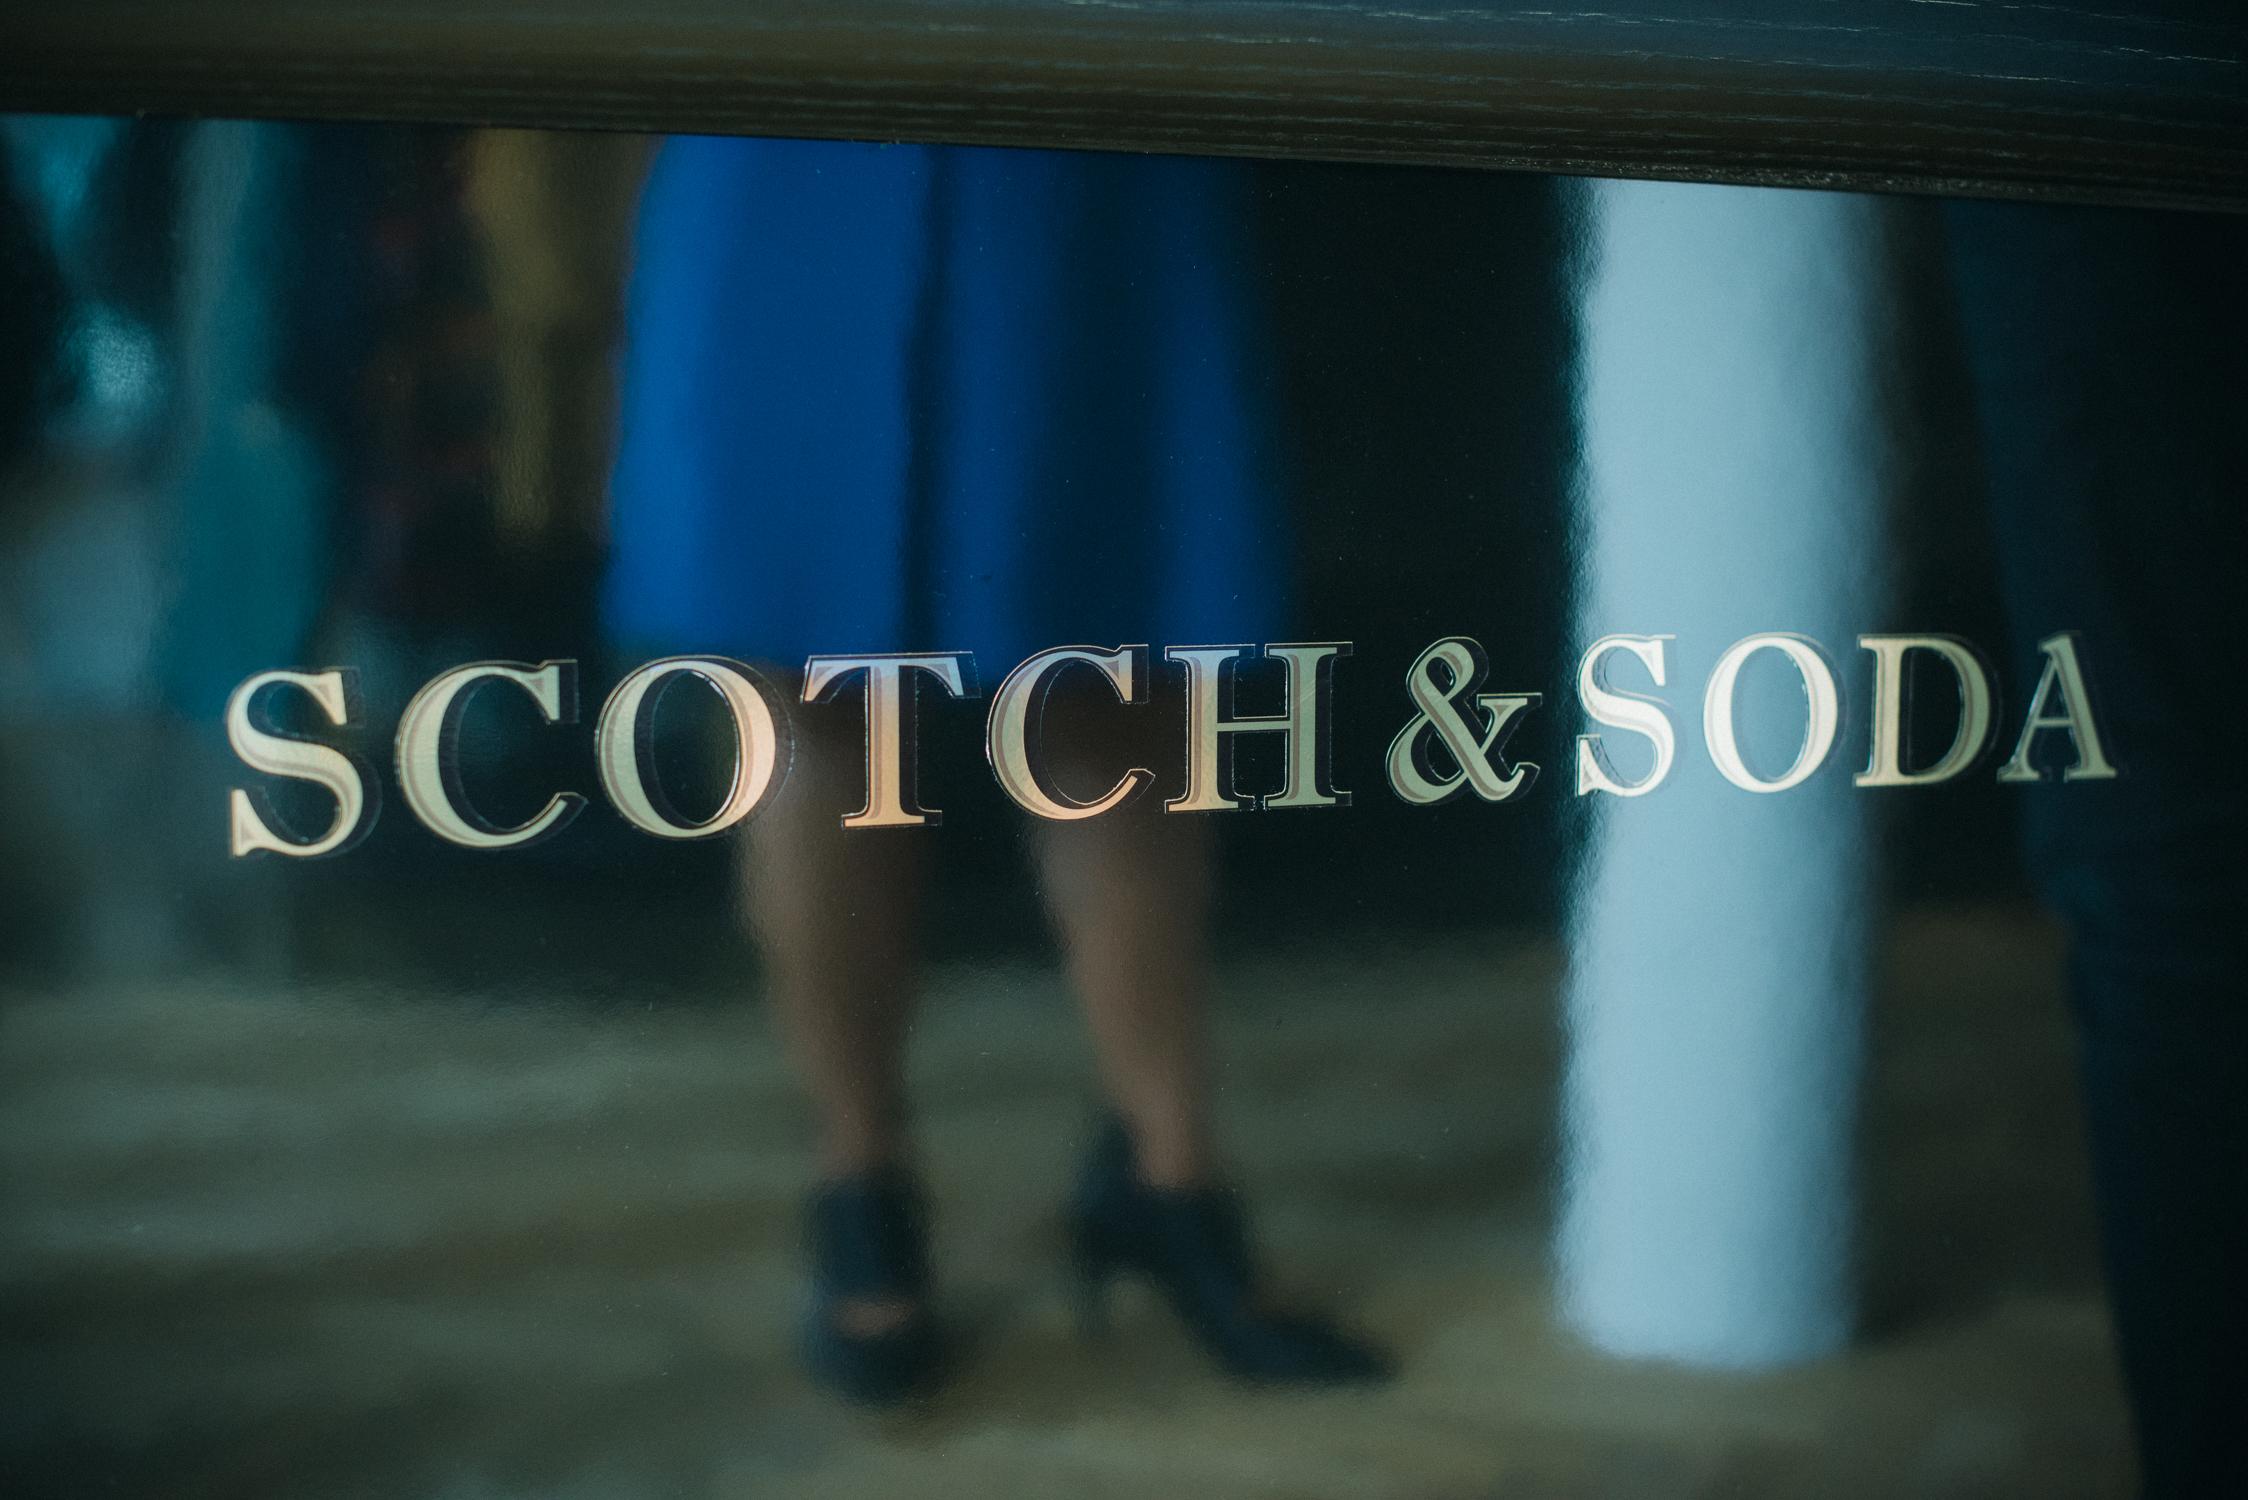 ScotchandSoda-219.jpg